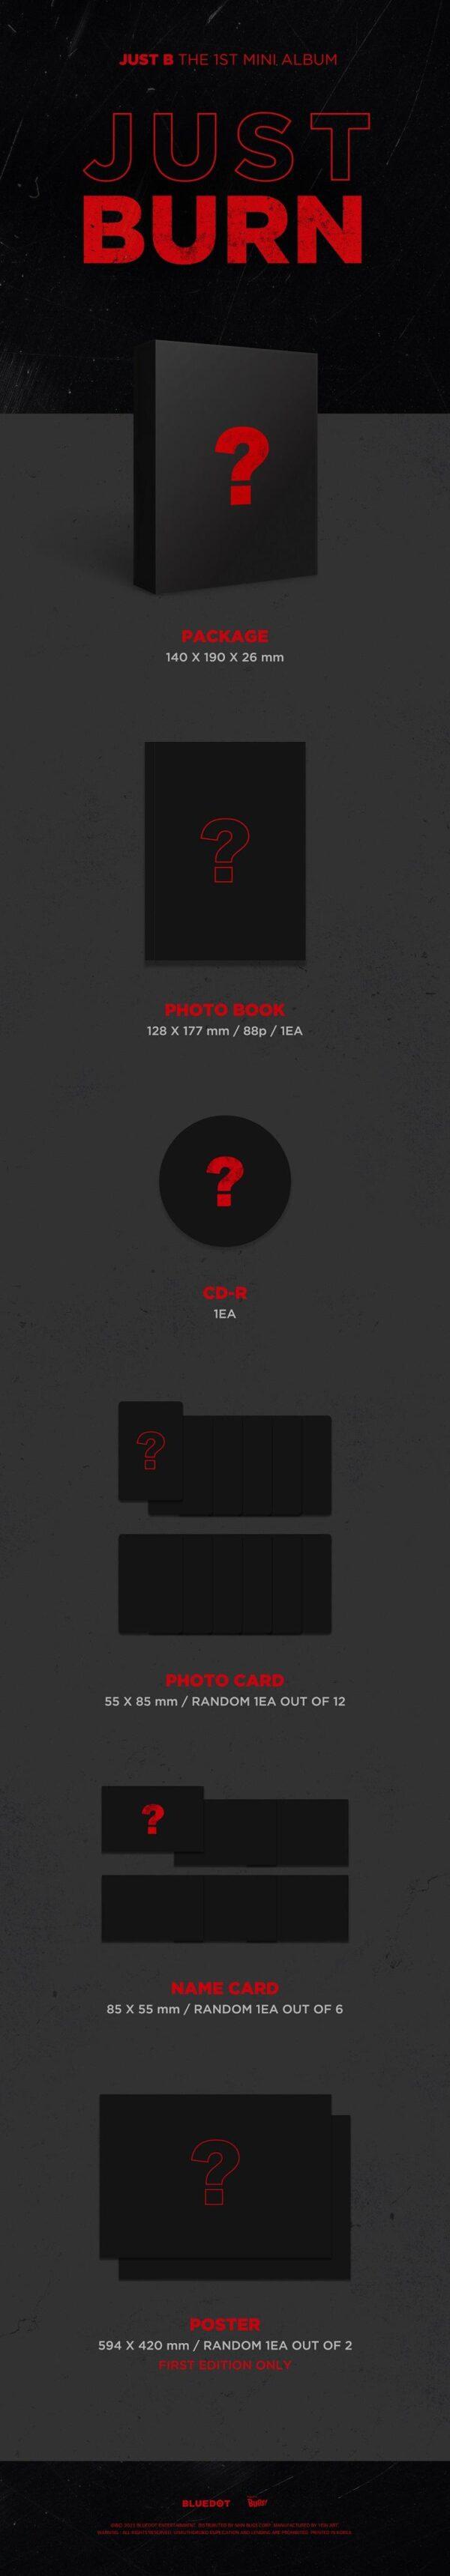 1st Mini Album de JUST B JUST BURN Poster 1